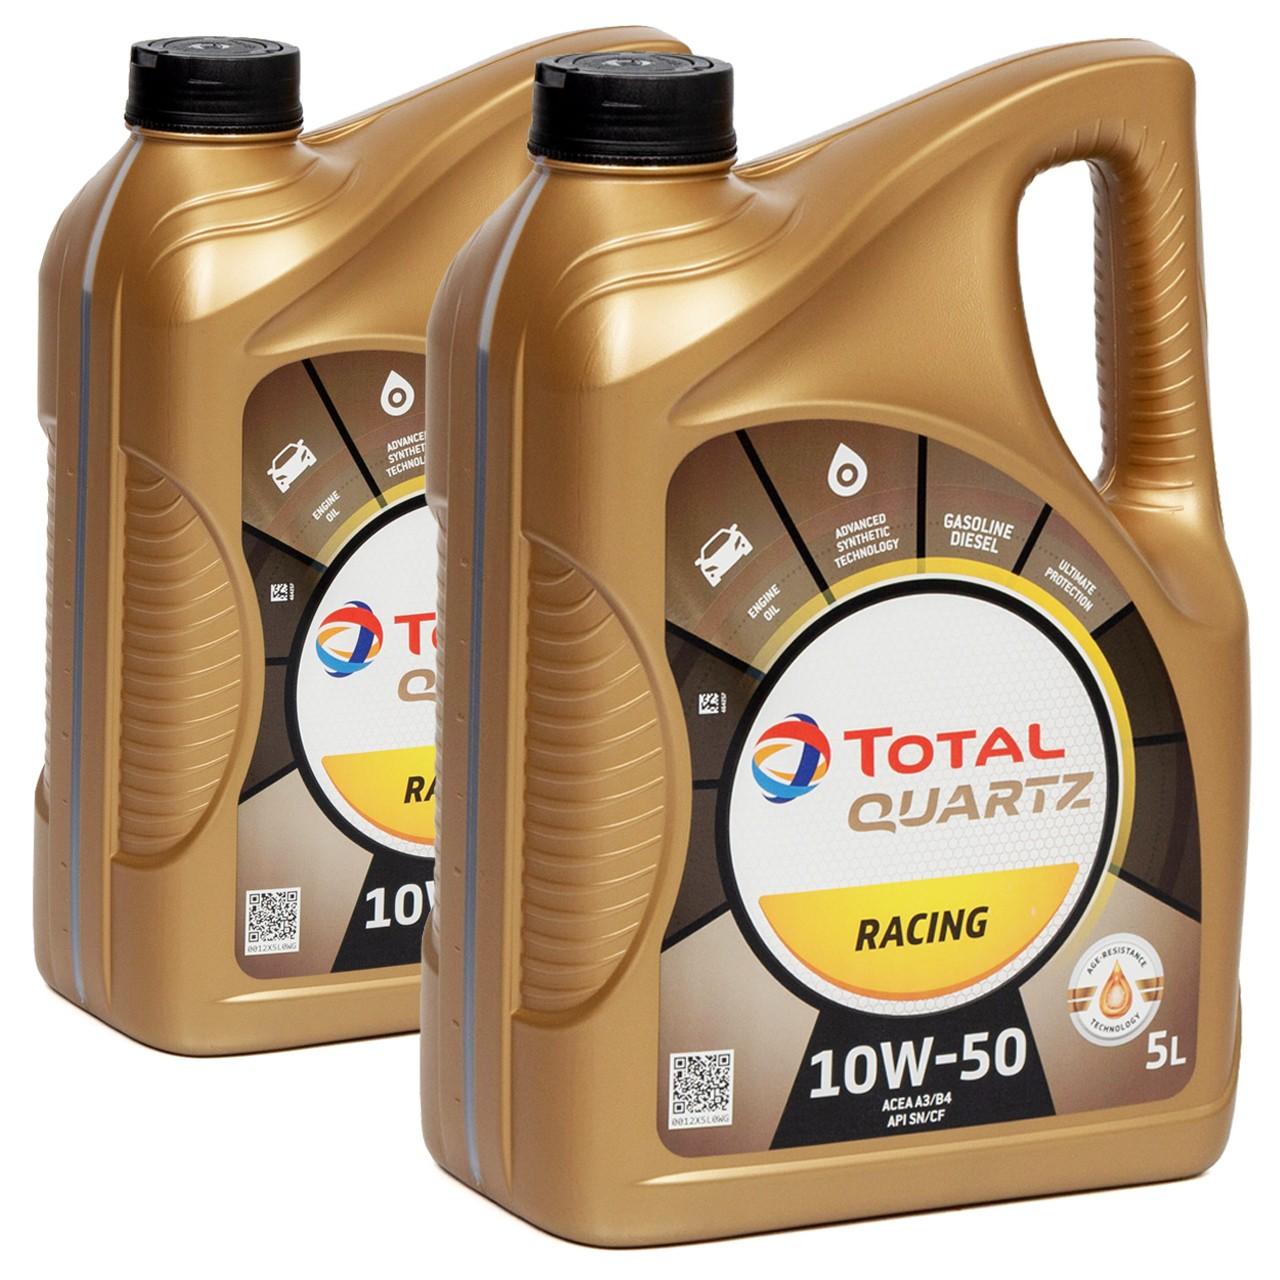 TOTAL QUARTZ RACING 10W-50 10W50 Motoröl Öl ACEA A3/B4 API SN/CF - 10L 10 Liter